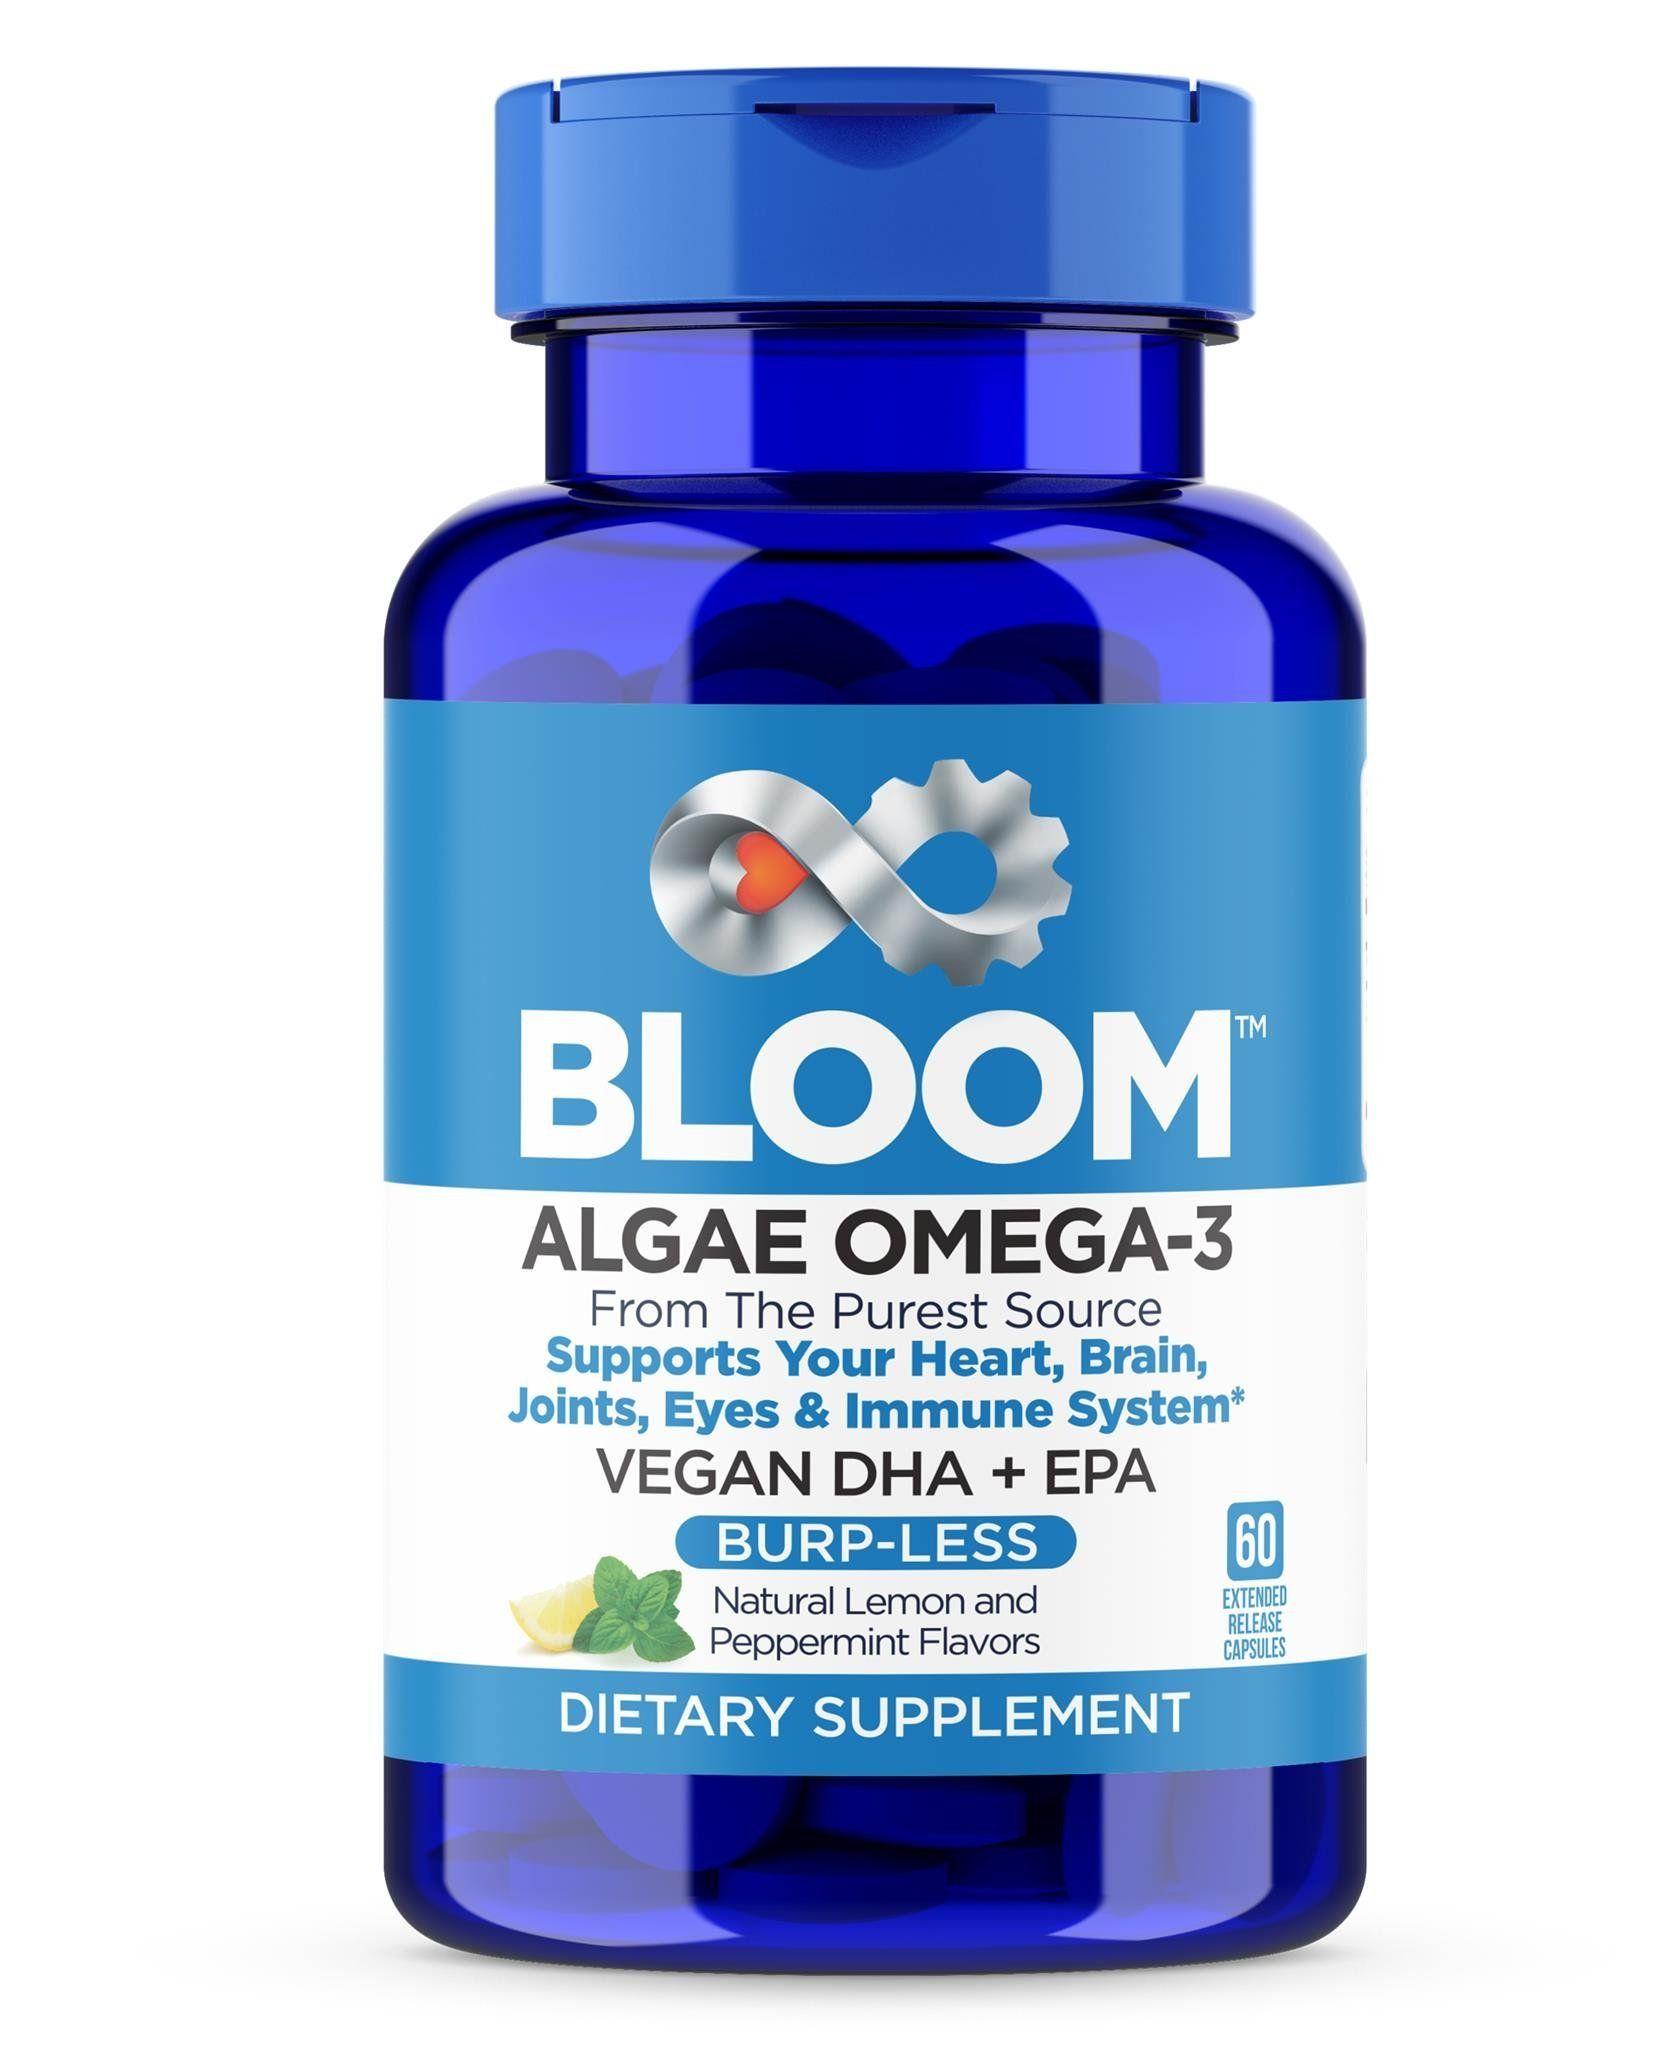 Bloom A Vegan Omega 3 Burpless Algae Dha Epa Supplement Better Than Fish Oil Supports Heart Brain Joint Prenata Fish Oils Supplements Supplements Fish Oil